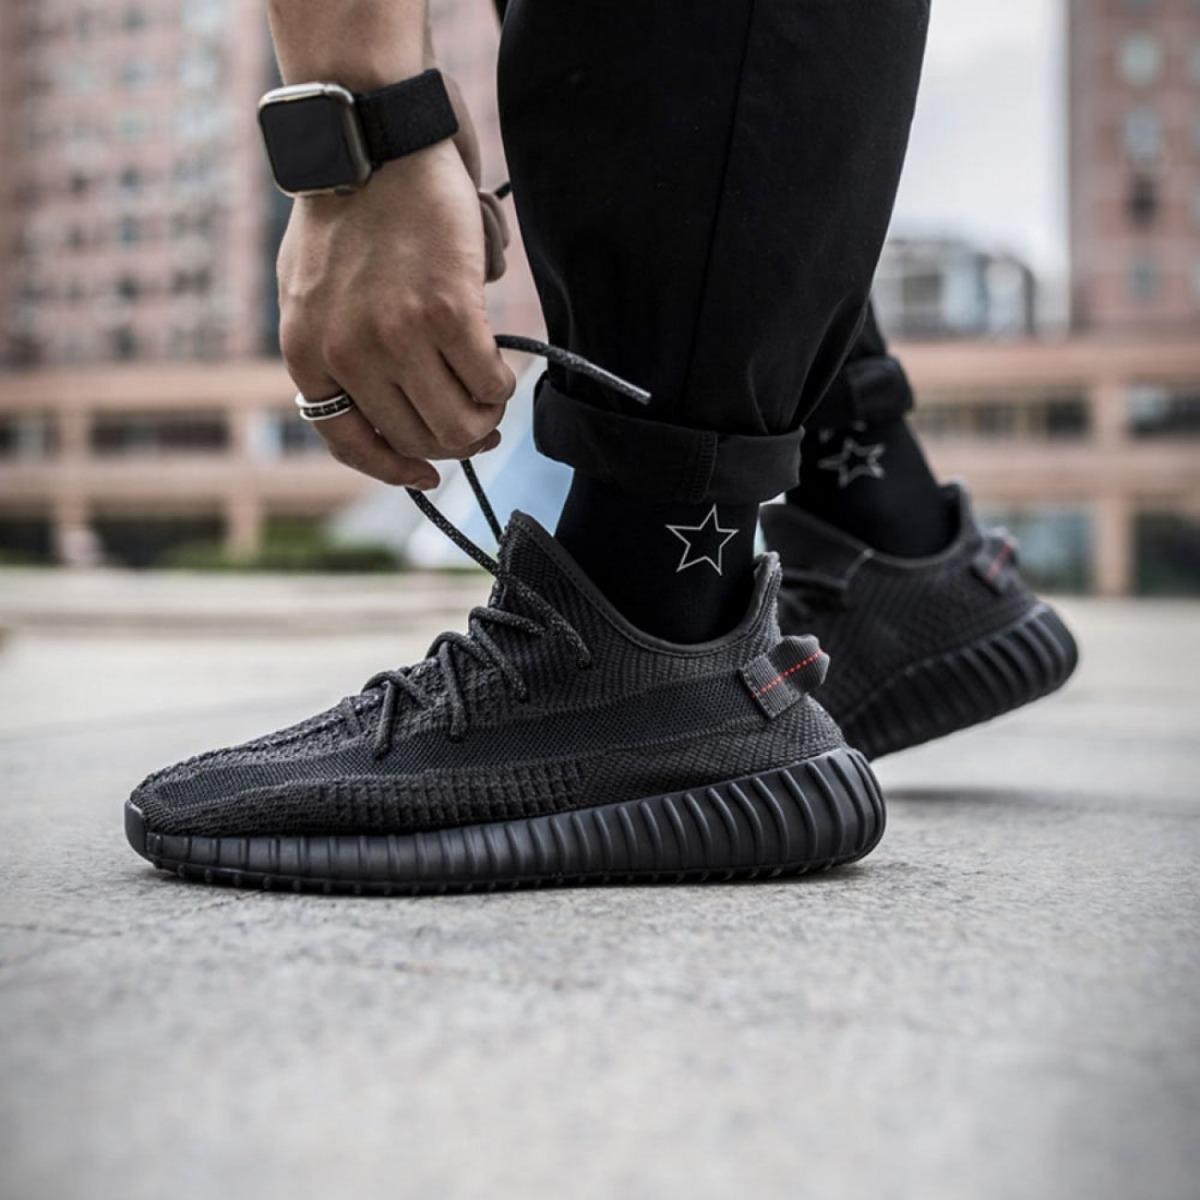 adidas yeezy 350 v2 black stück